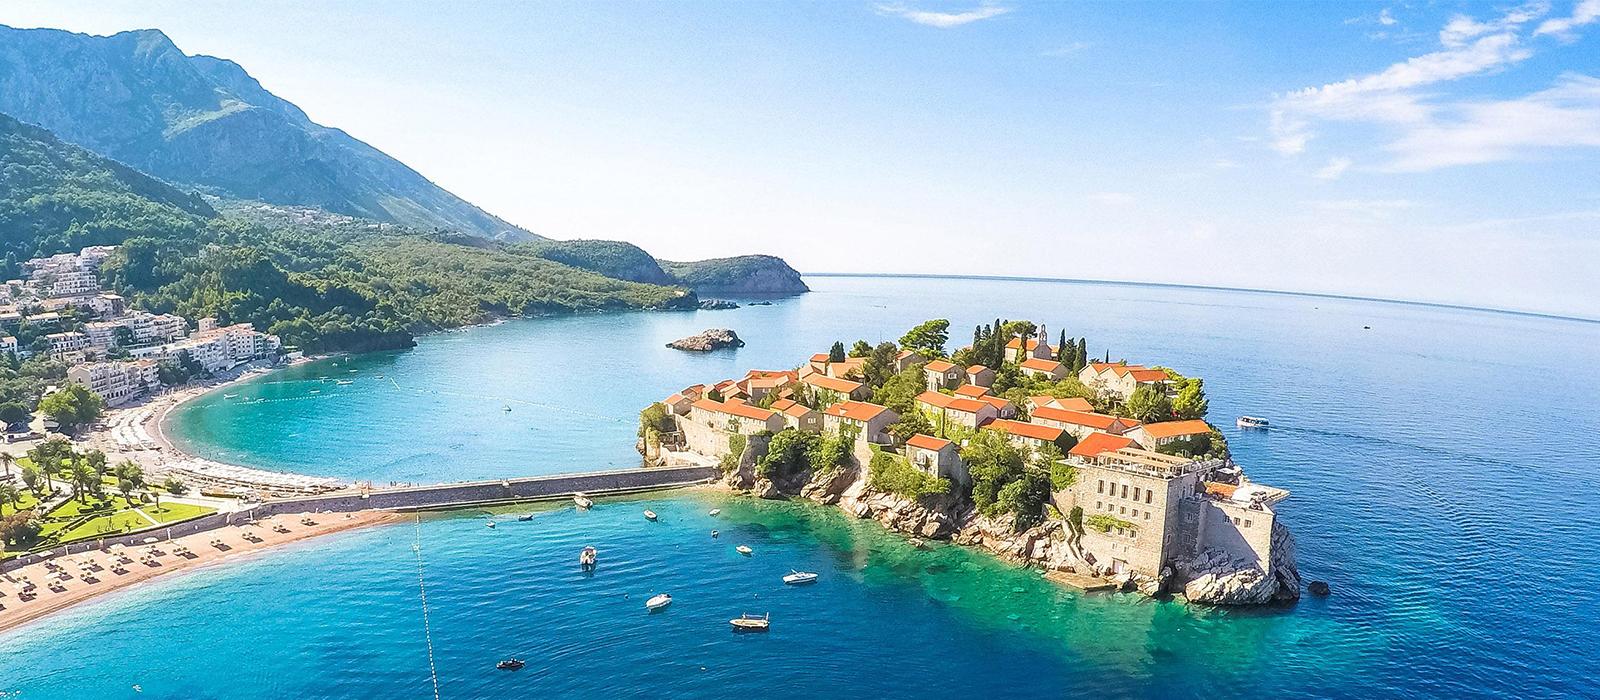 Aman: Sveti Stefan, a jewel on the coastline of Montenegro